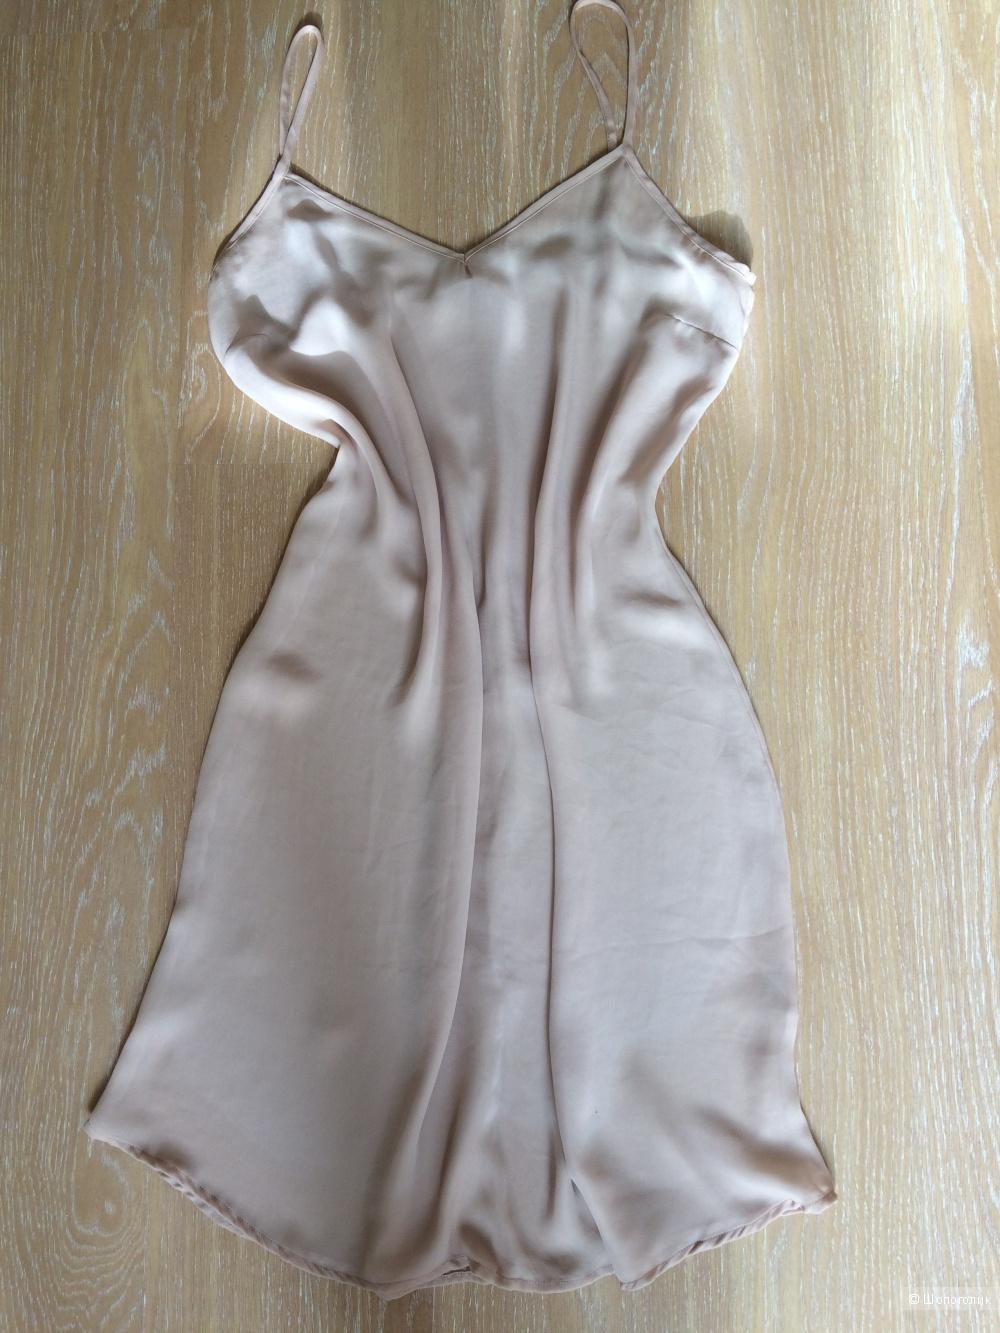 Шёлковое платье Massimo Dutti, р-р 42-44